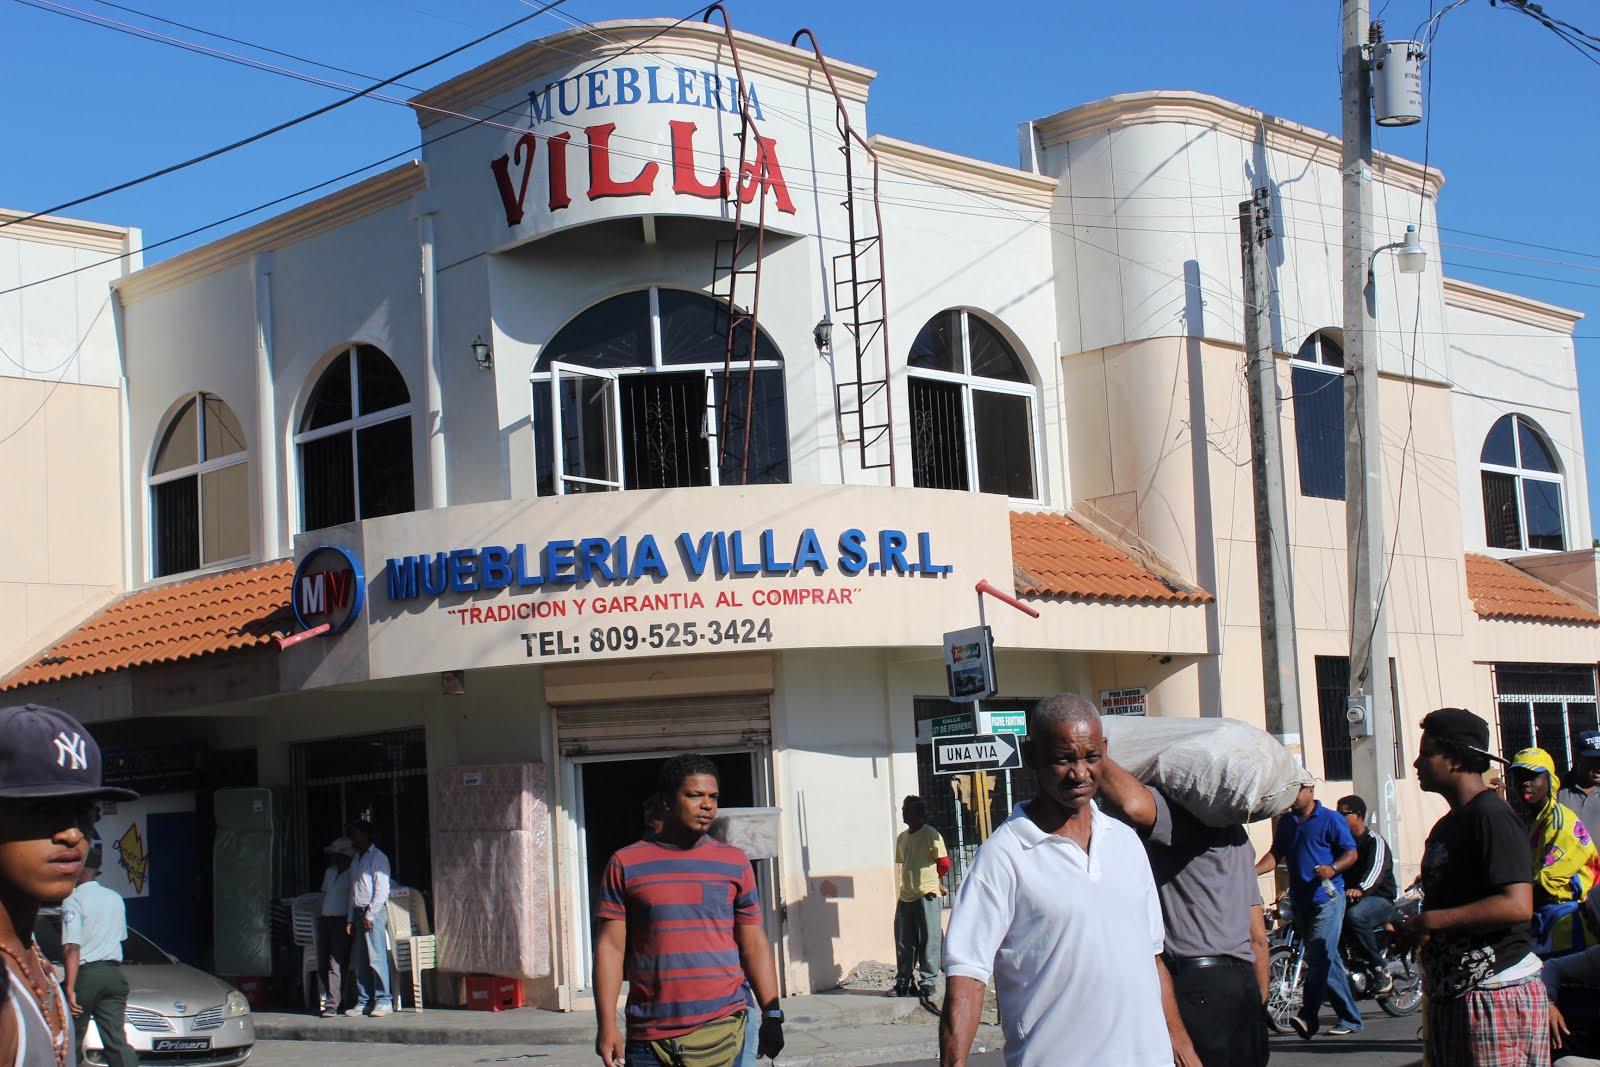 MUEBLERIA VILLA